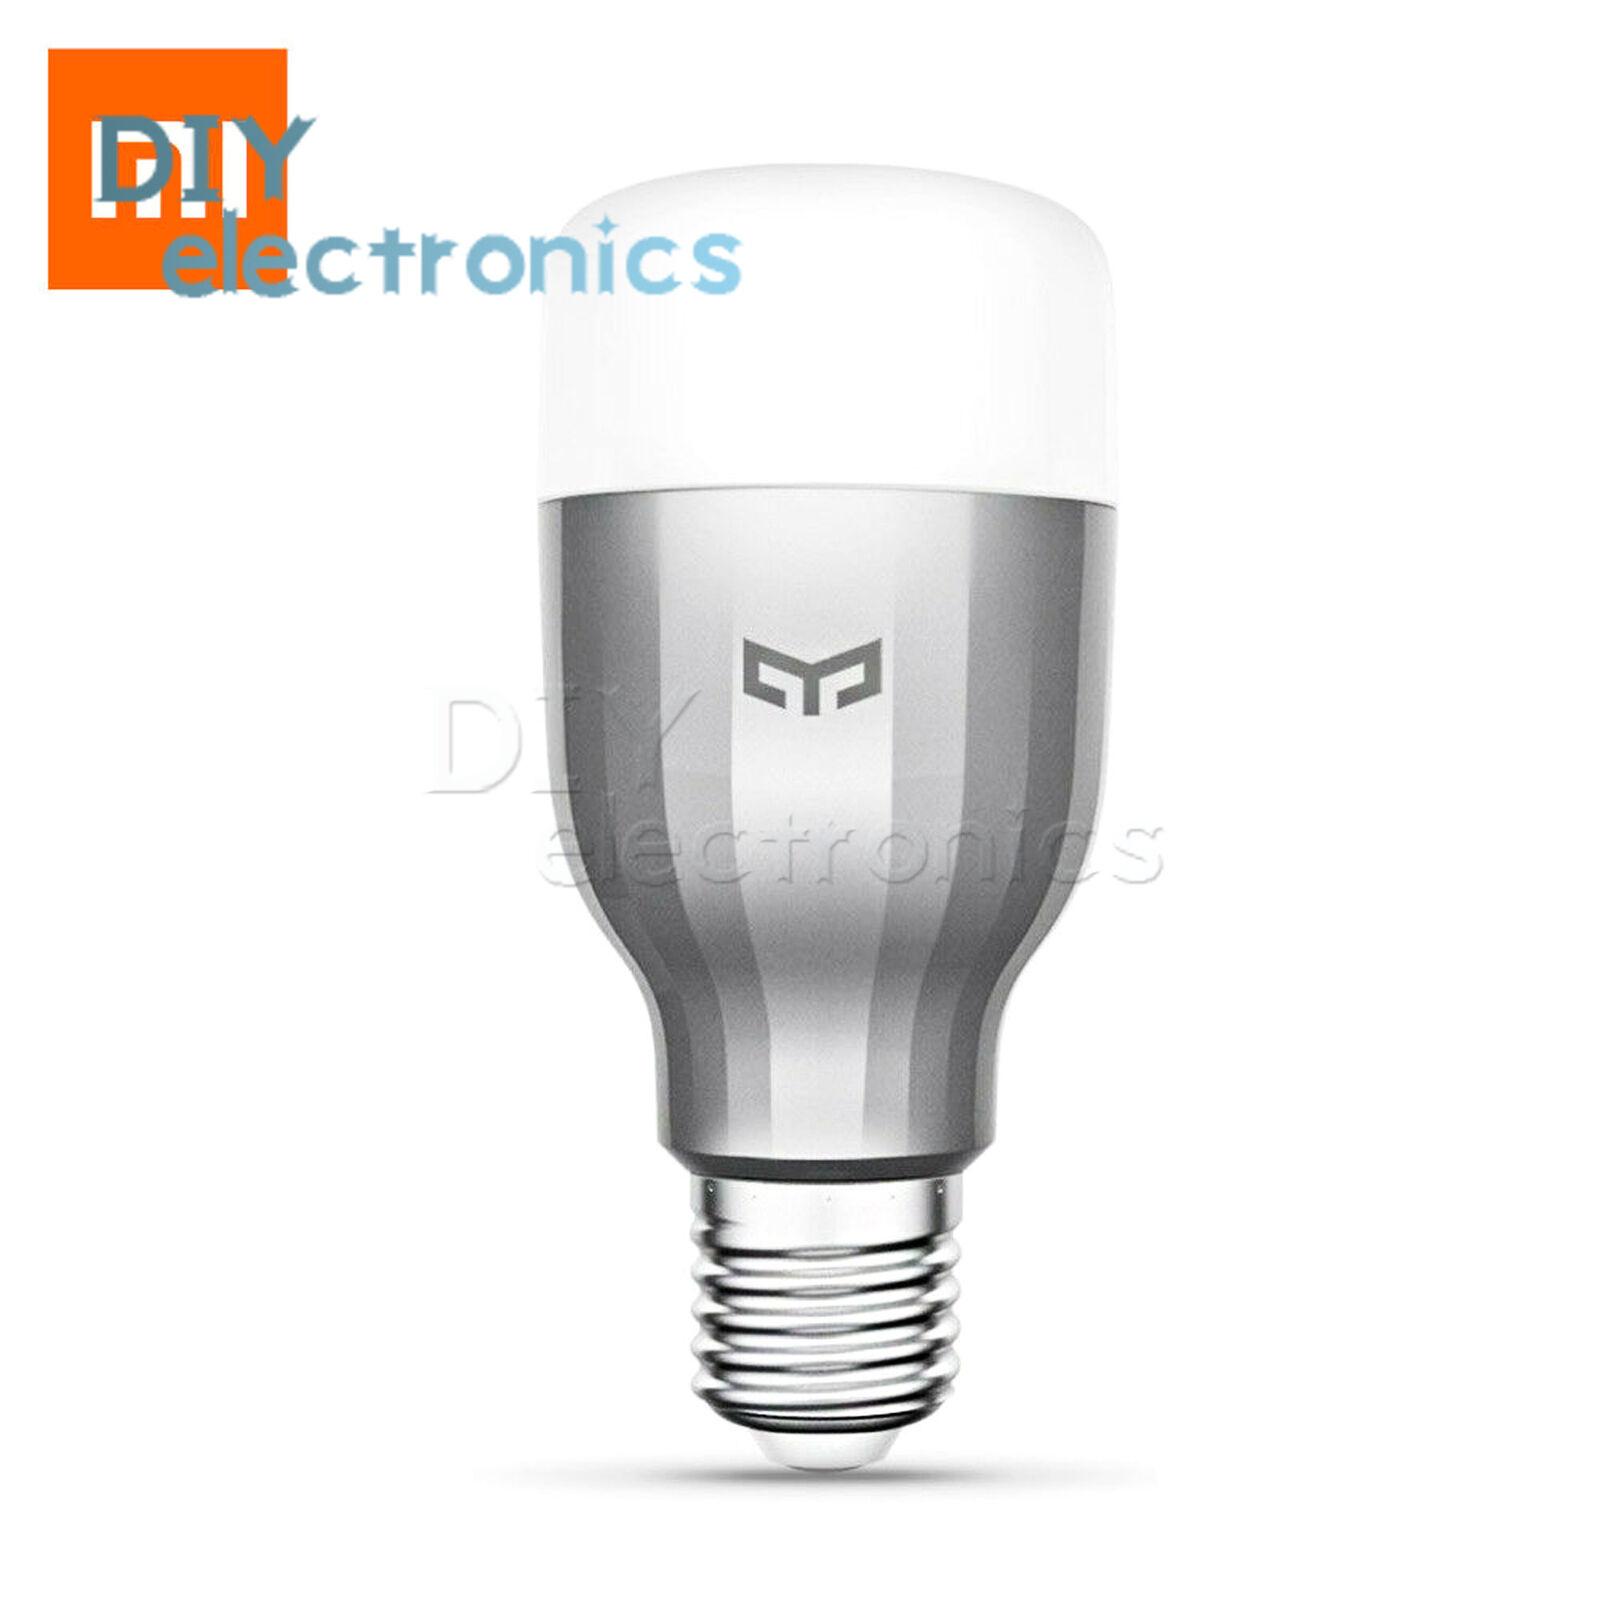 Xiaomi Yeelight E27 Smart LED Color Bulb RGB WIFI Control Night Light Certified